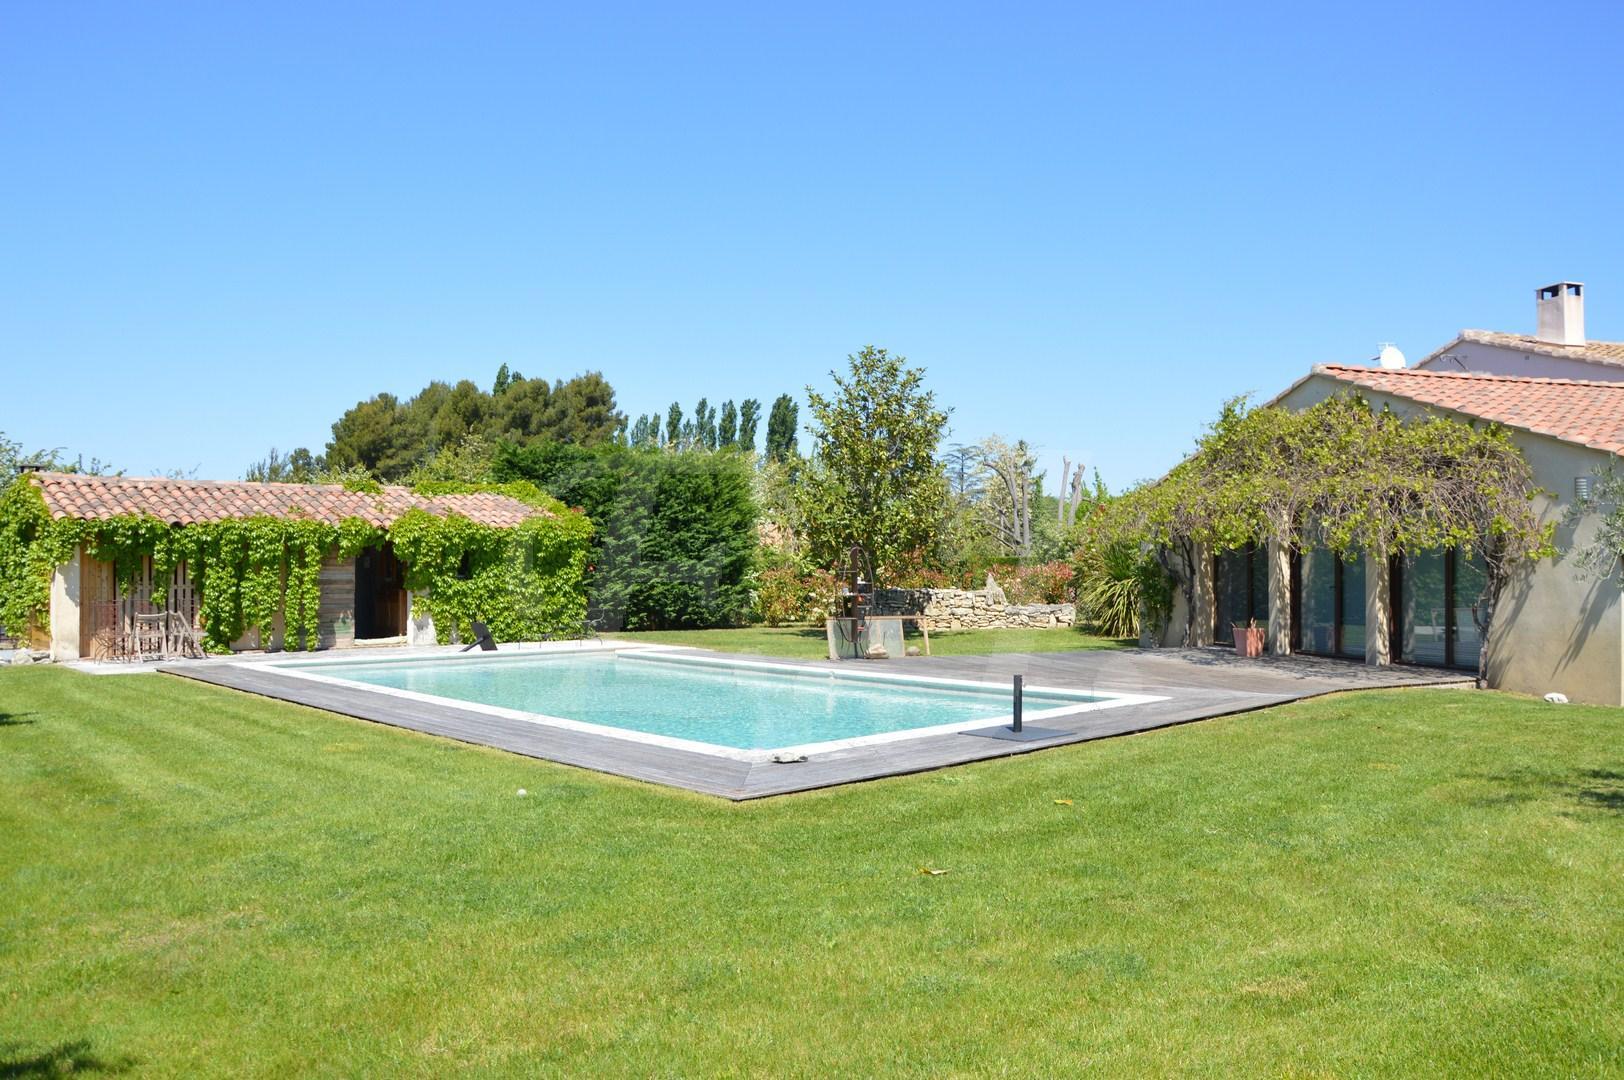 Ventes villa t7 f7 maubec maison de plain pied avec grands for Vente tuyau piscine